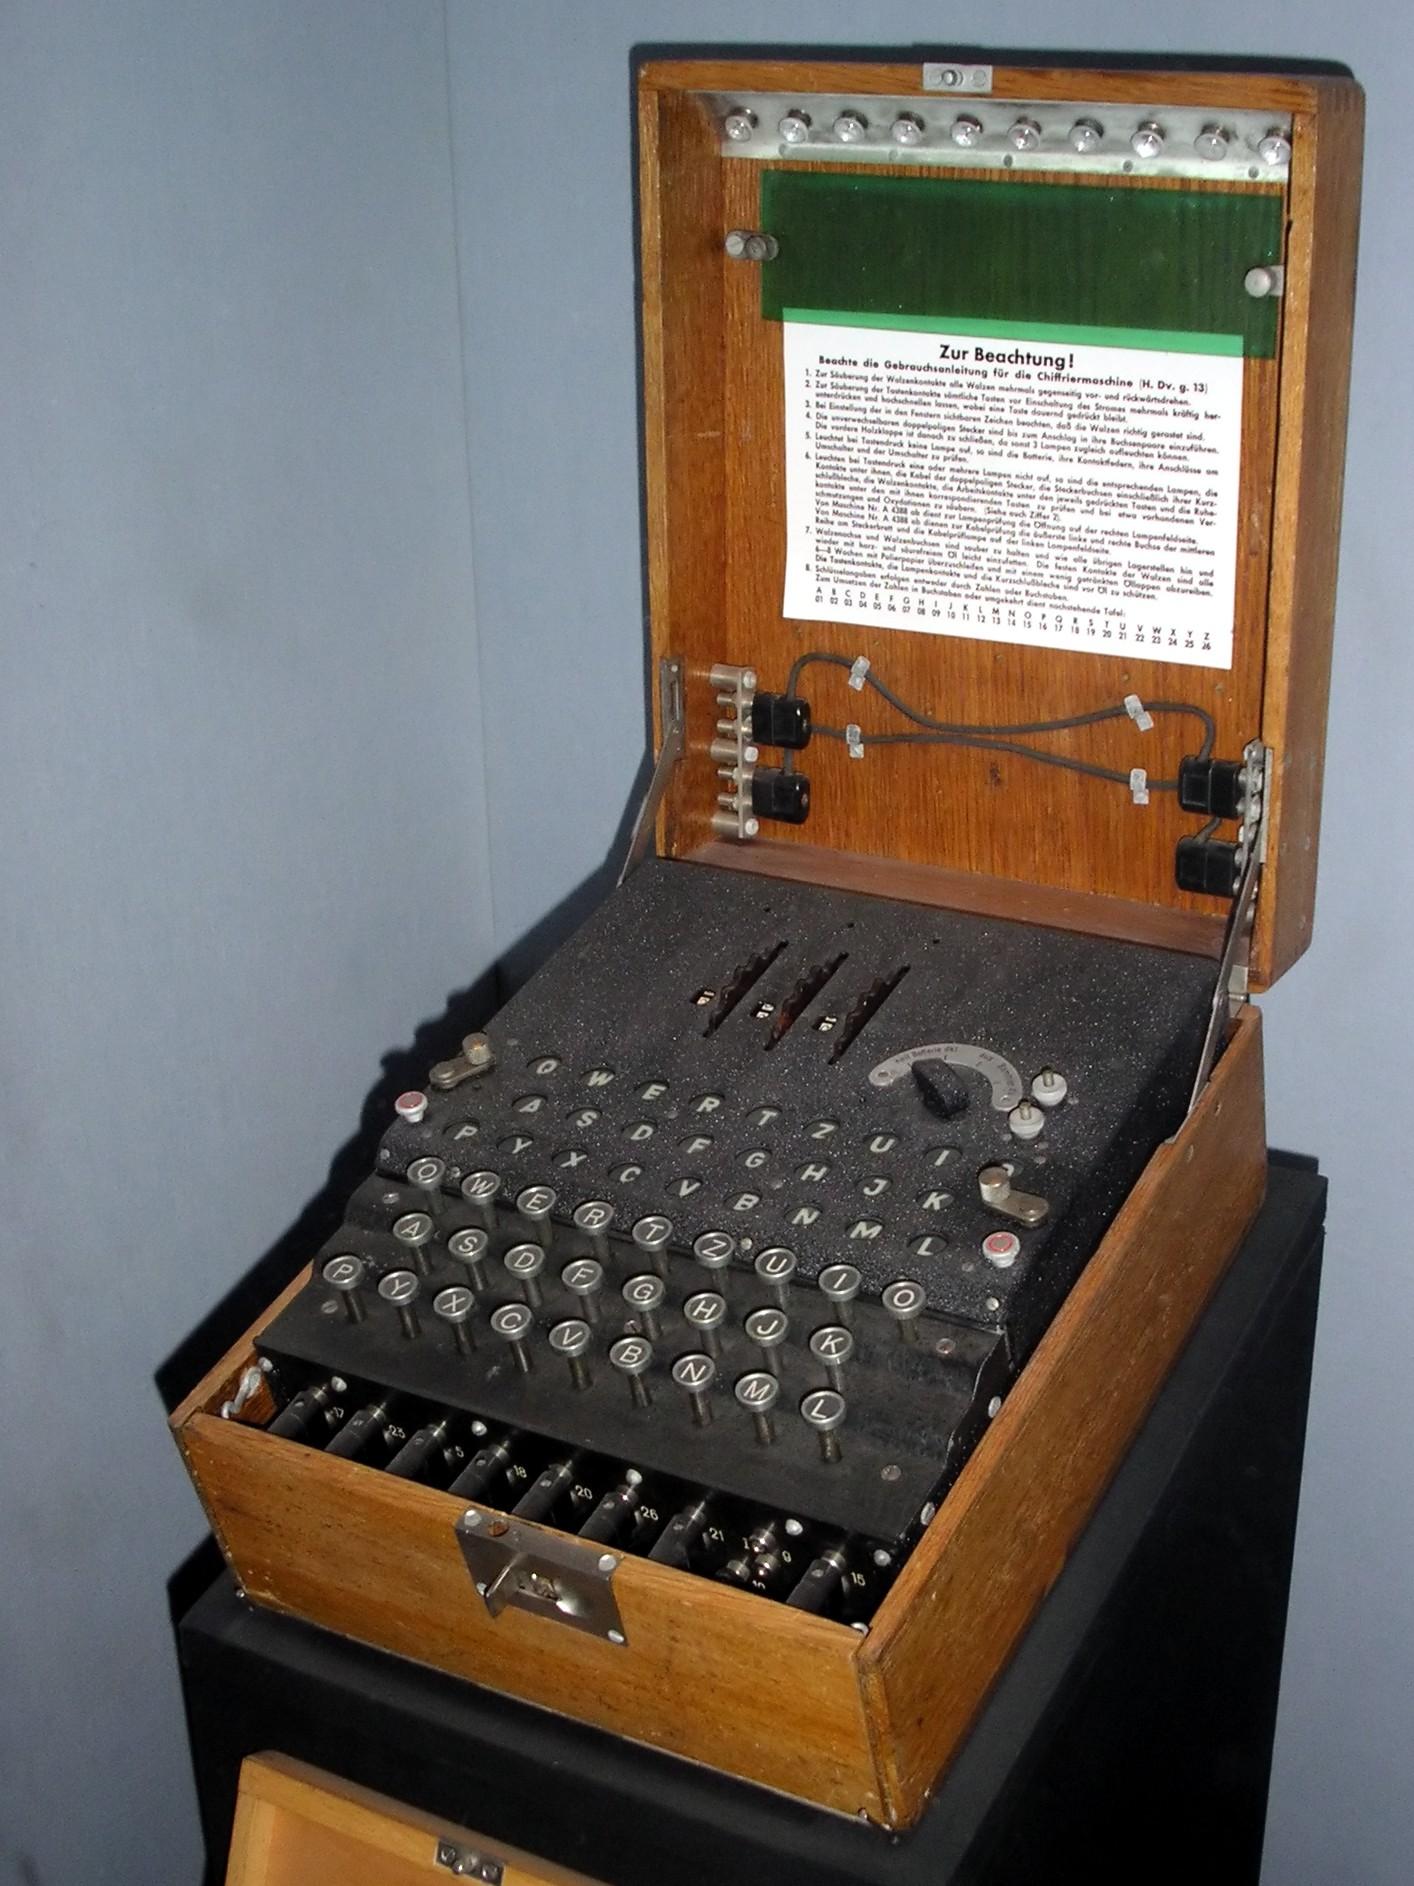 external image EnigmaMachine.jpg